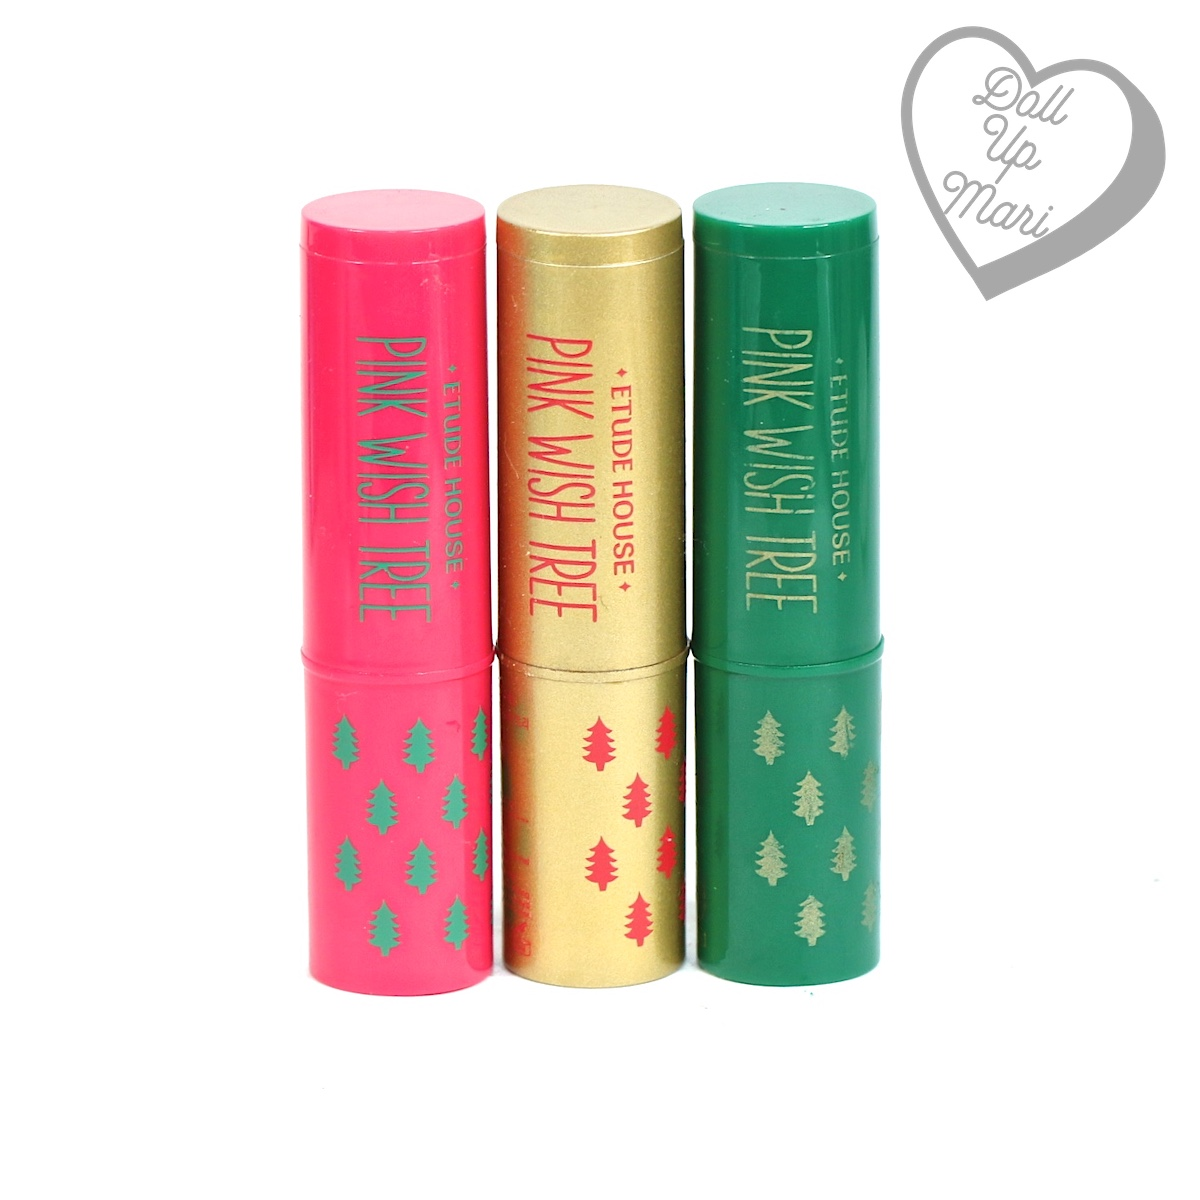 Etude House Pink Wish Tree Lip Balms